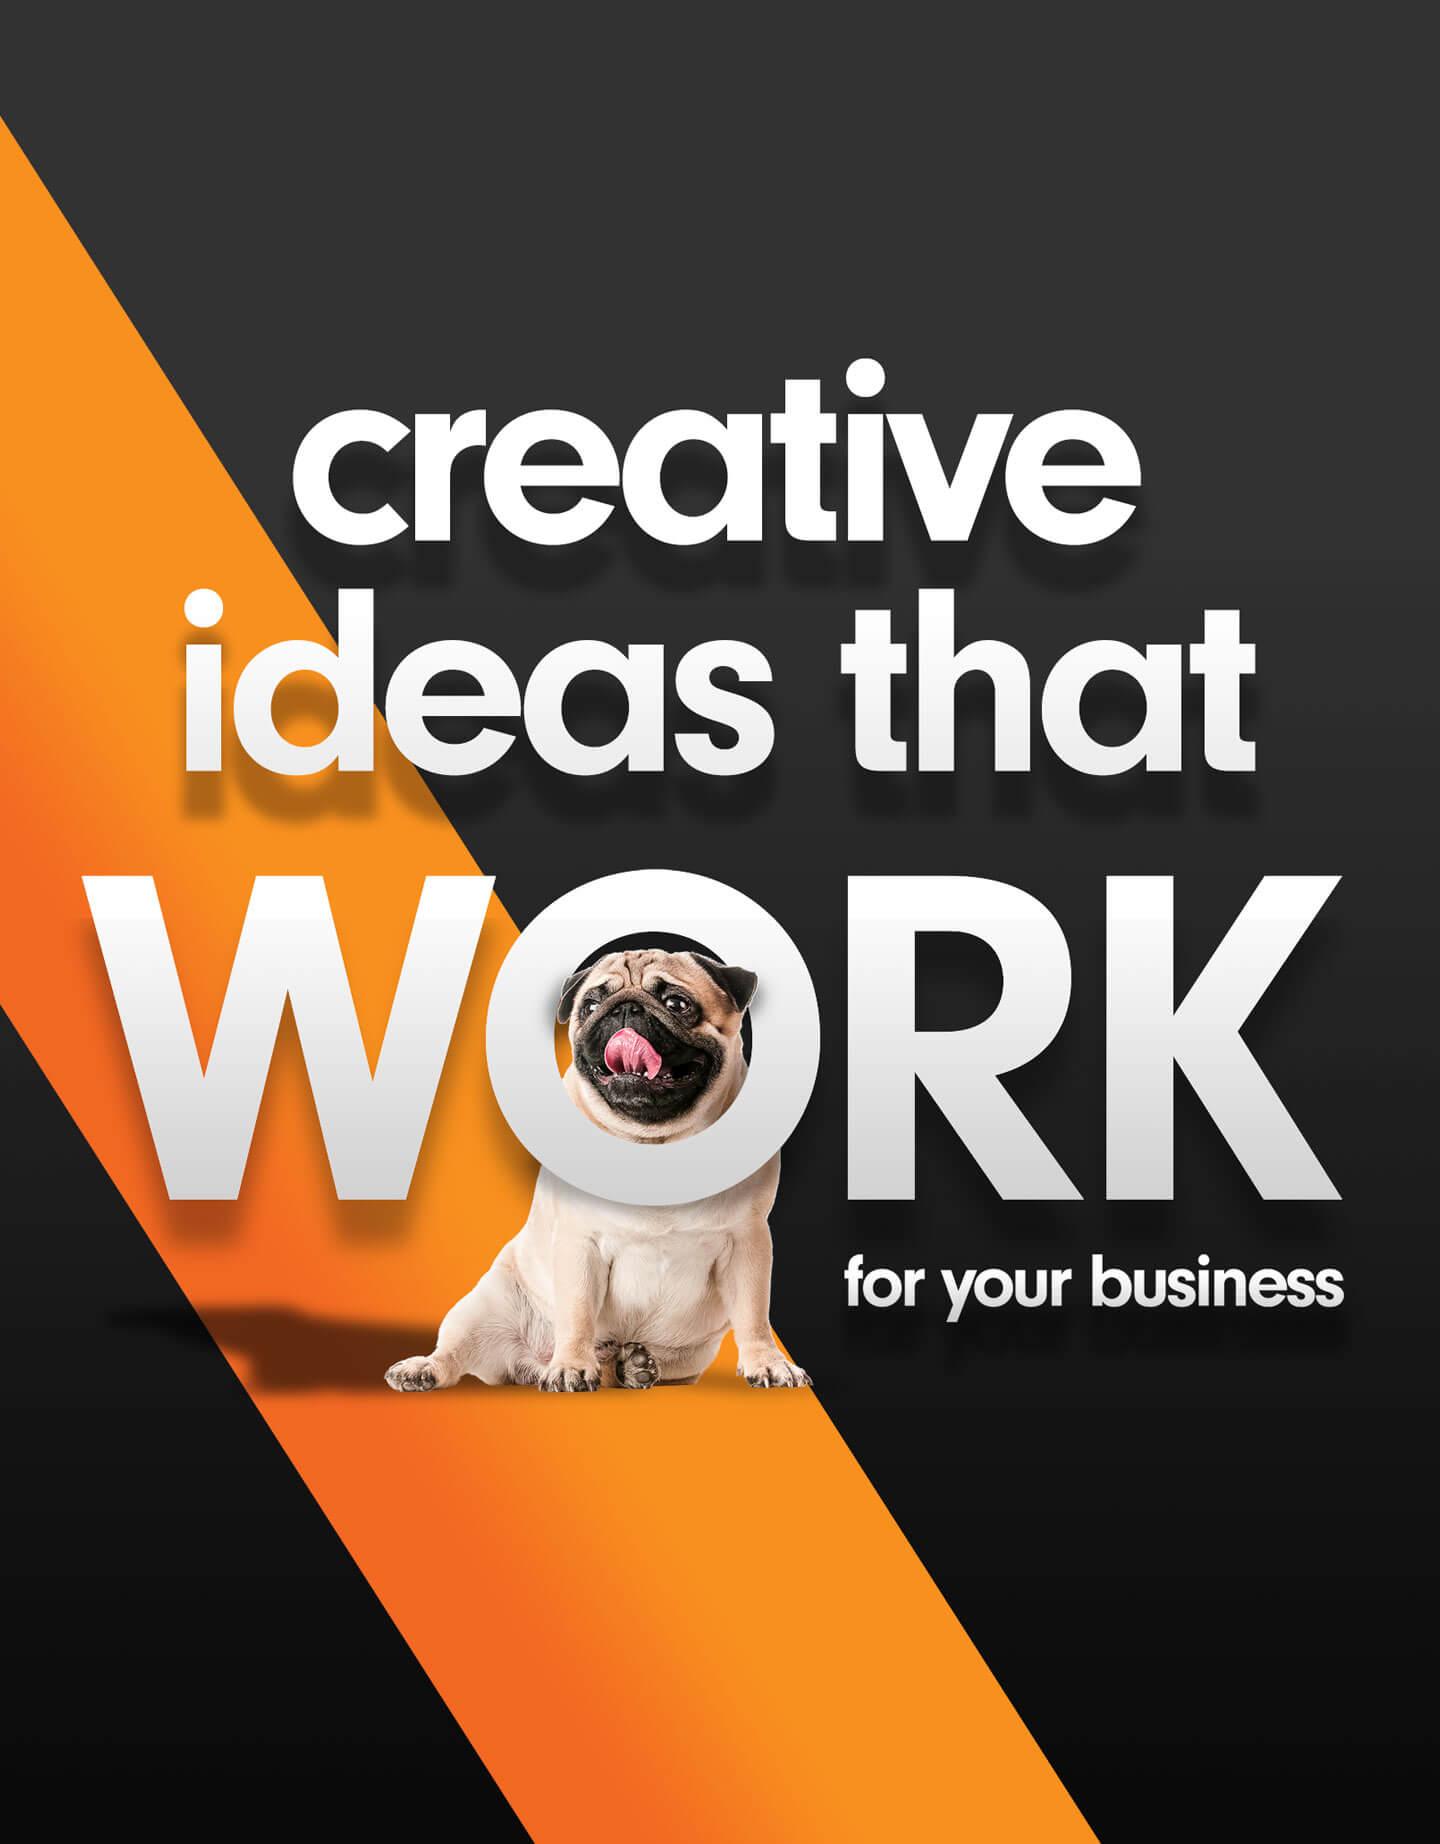 Web design agency Kent